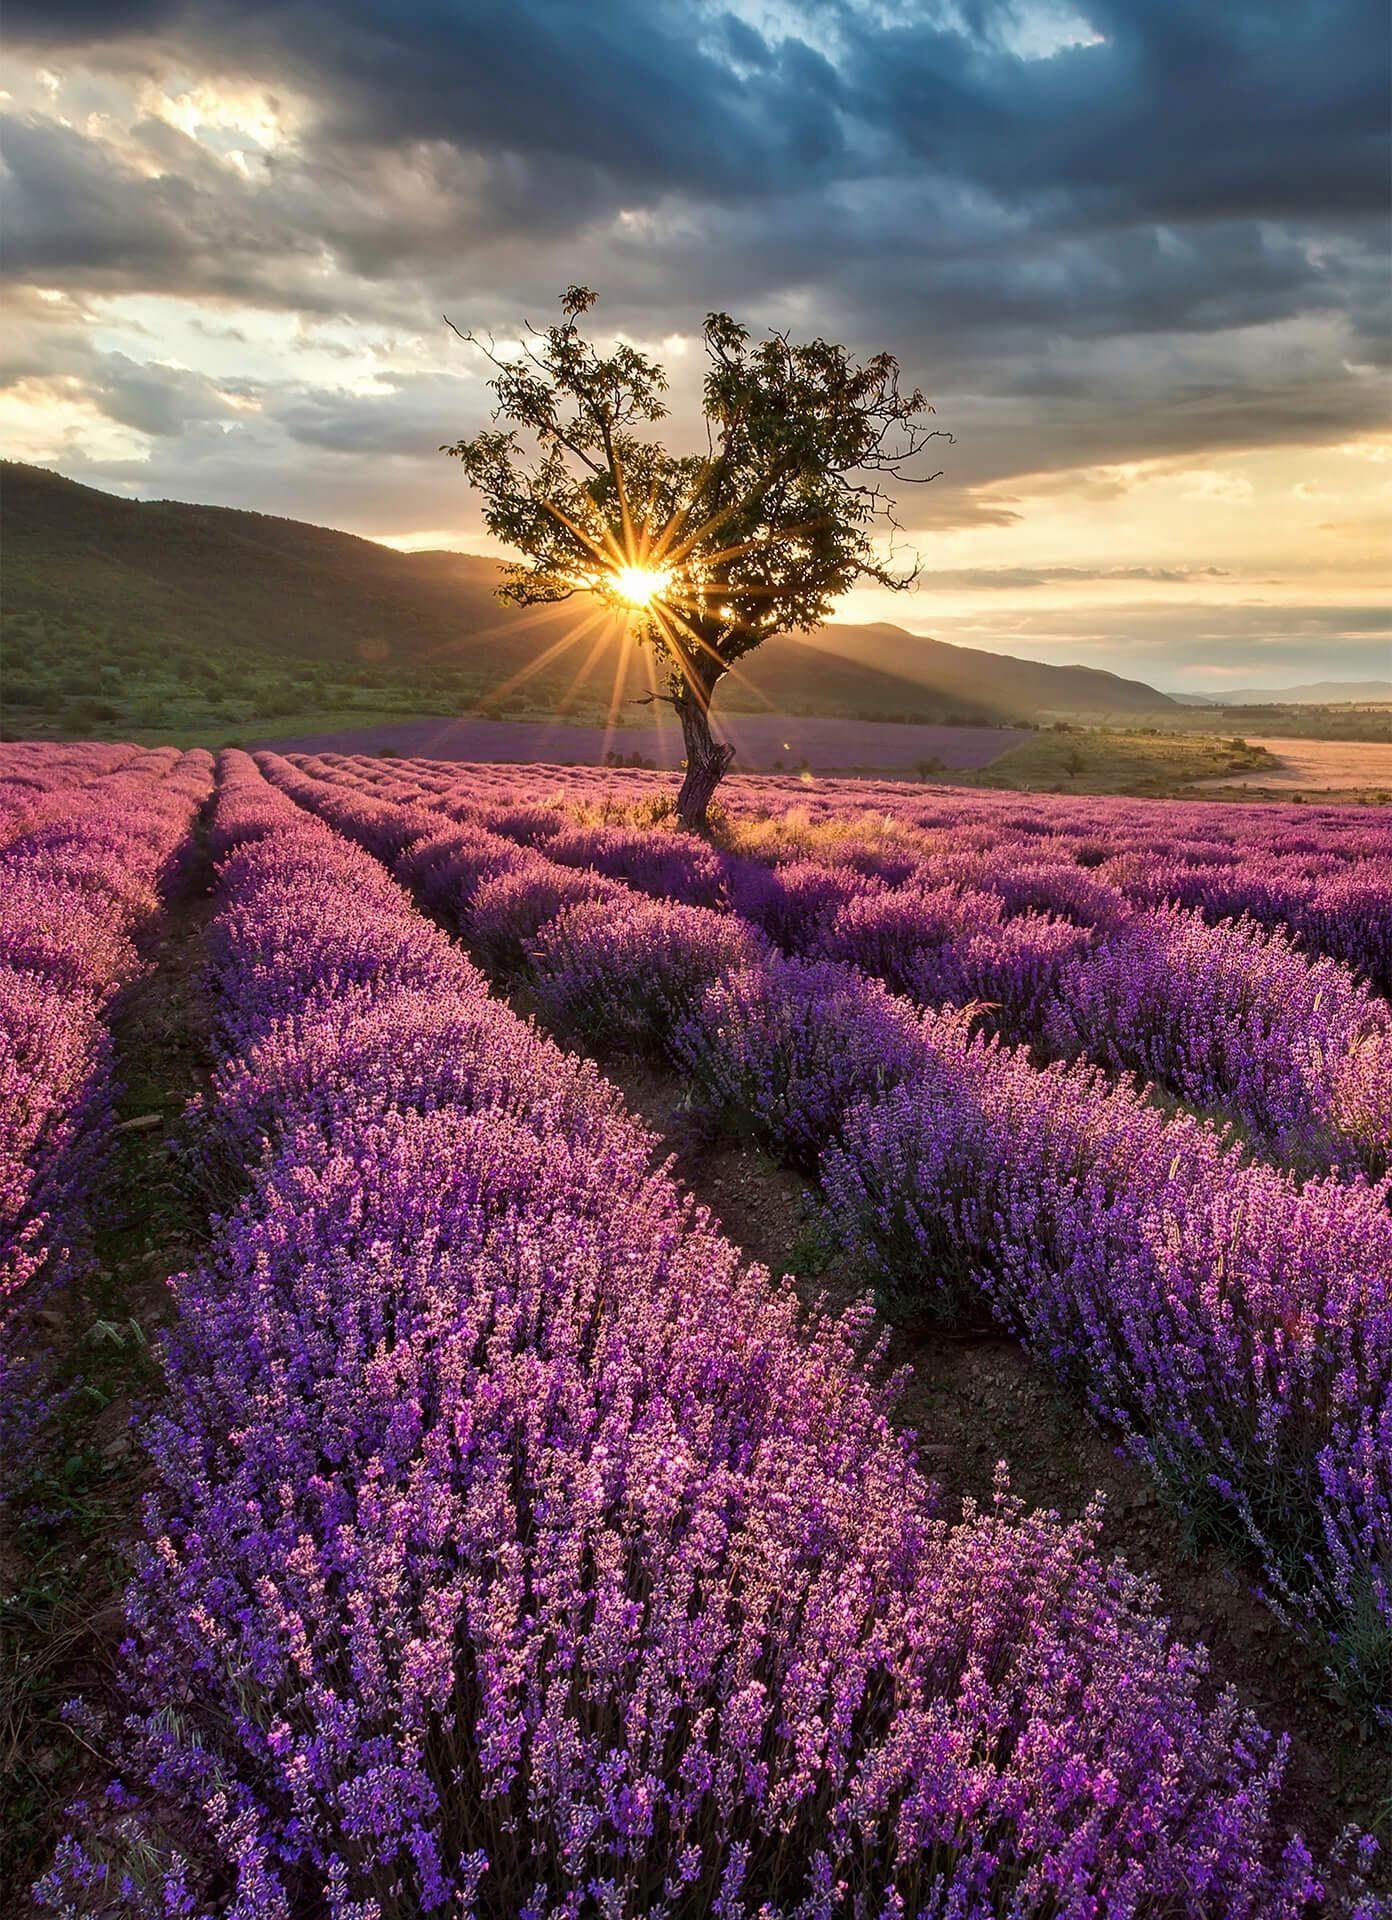 Fototapete »Lavendelblüte in der Provence«, 183/254 cm